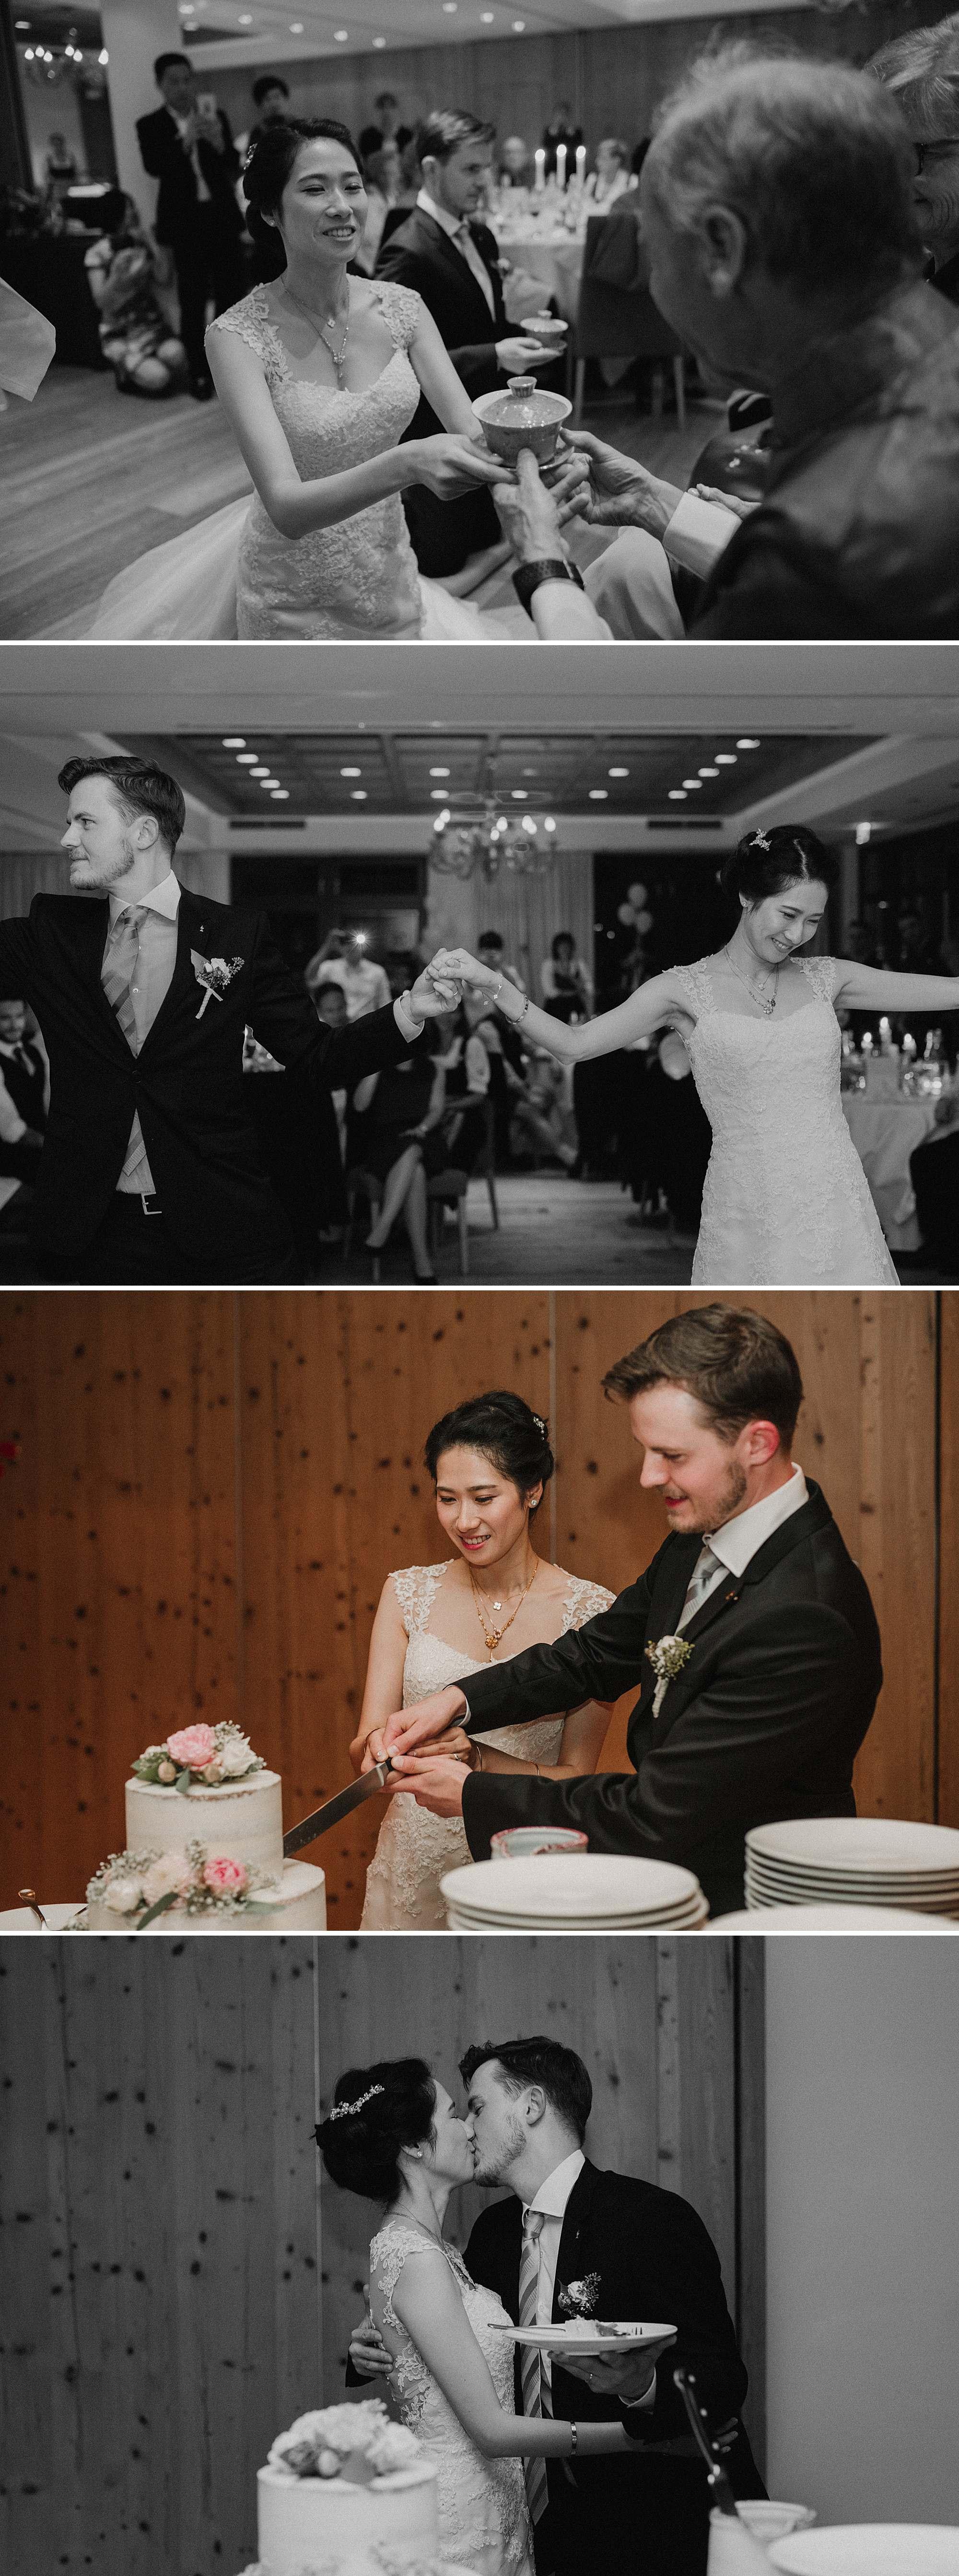 kitzbuehel wedding photographer_0100.jpg